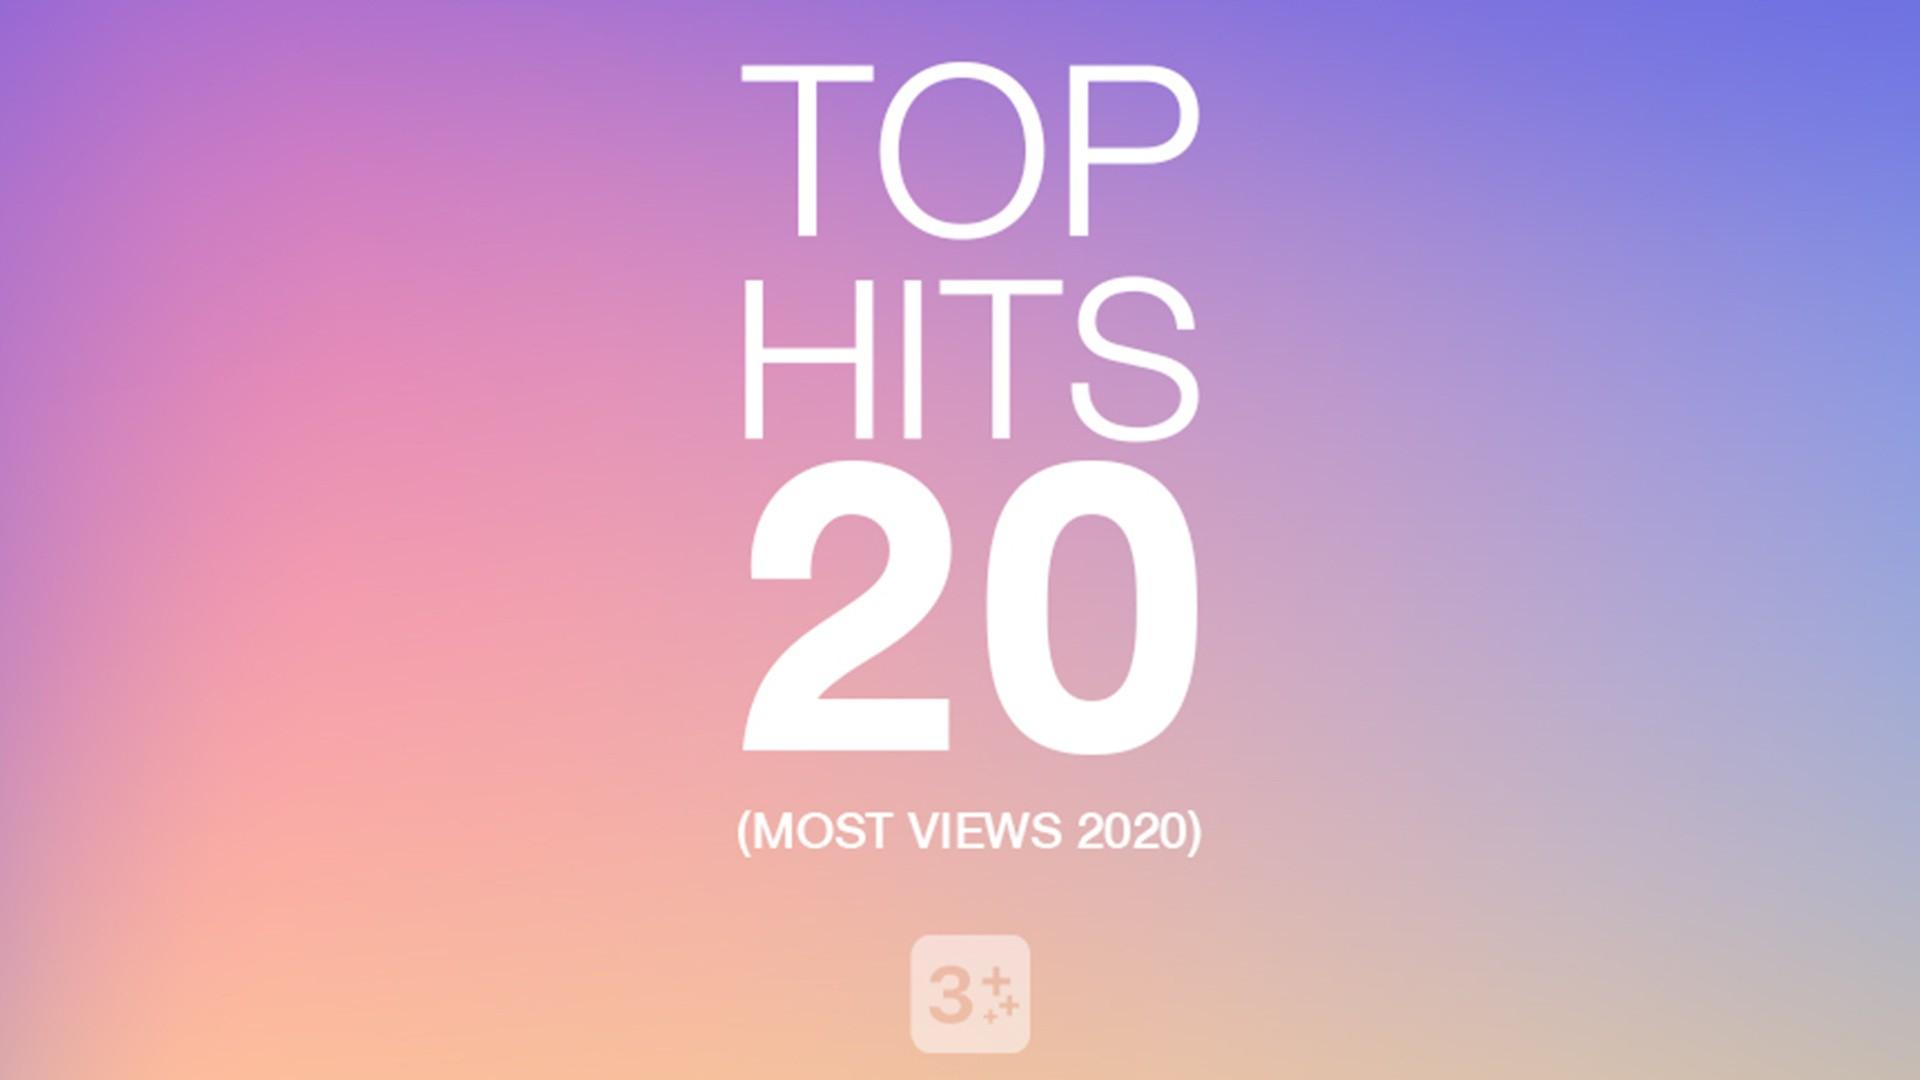 Top Hits 20 - Most views 2020